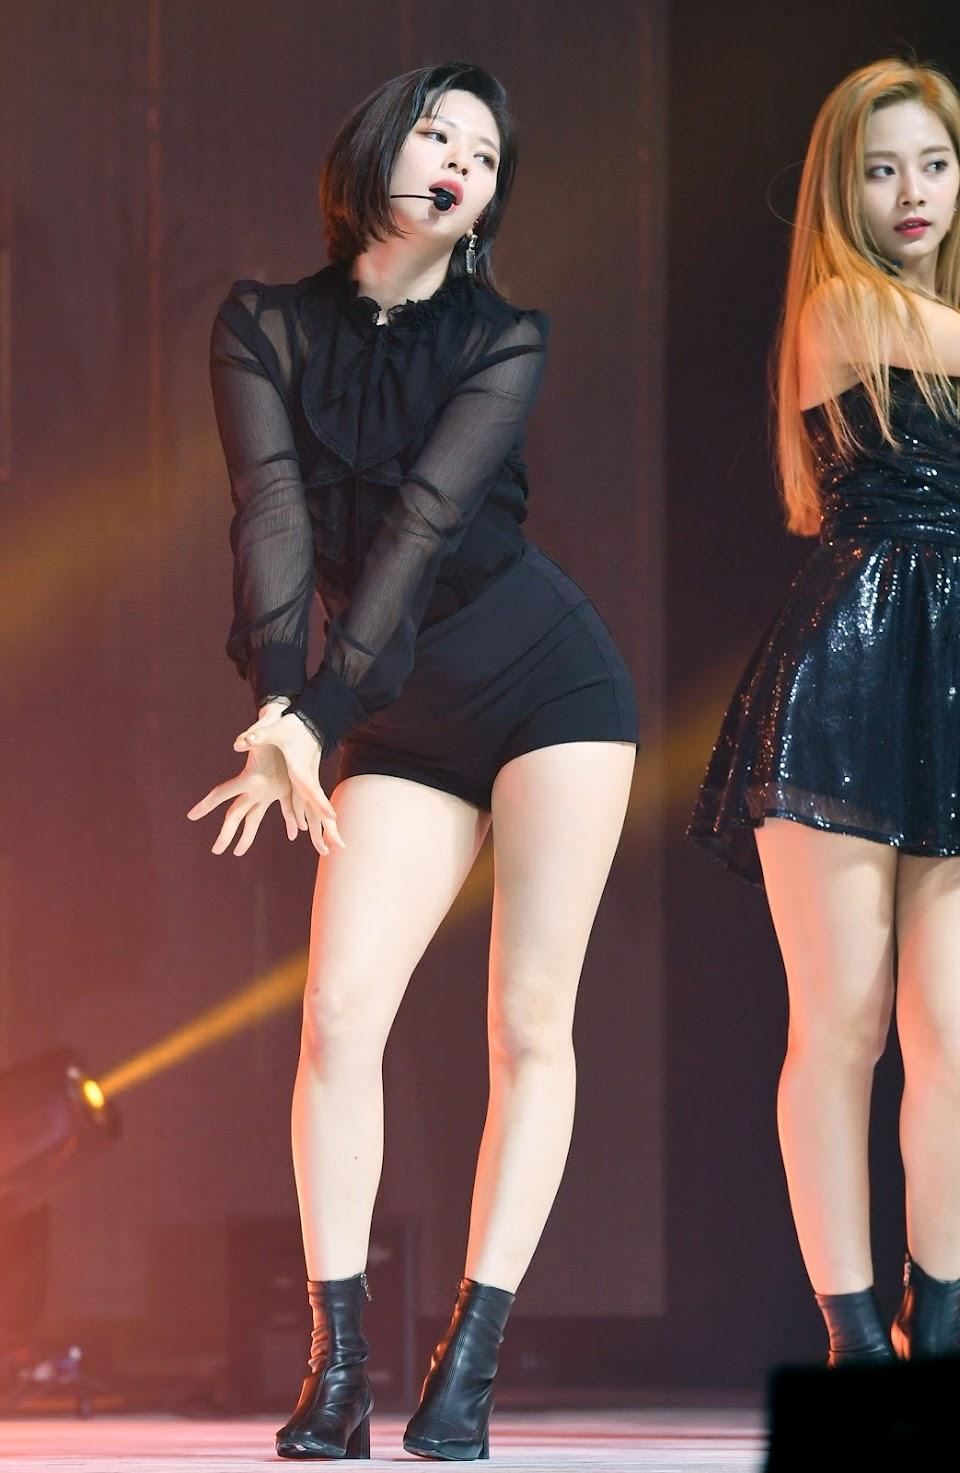 jeongyeon legs 21